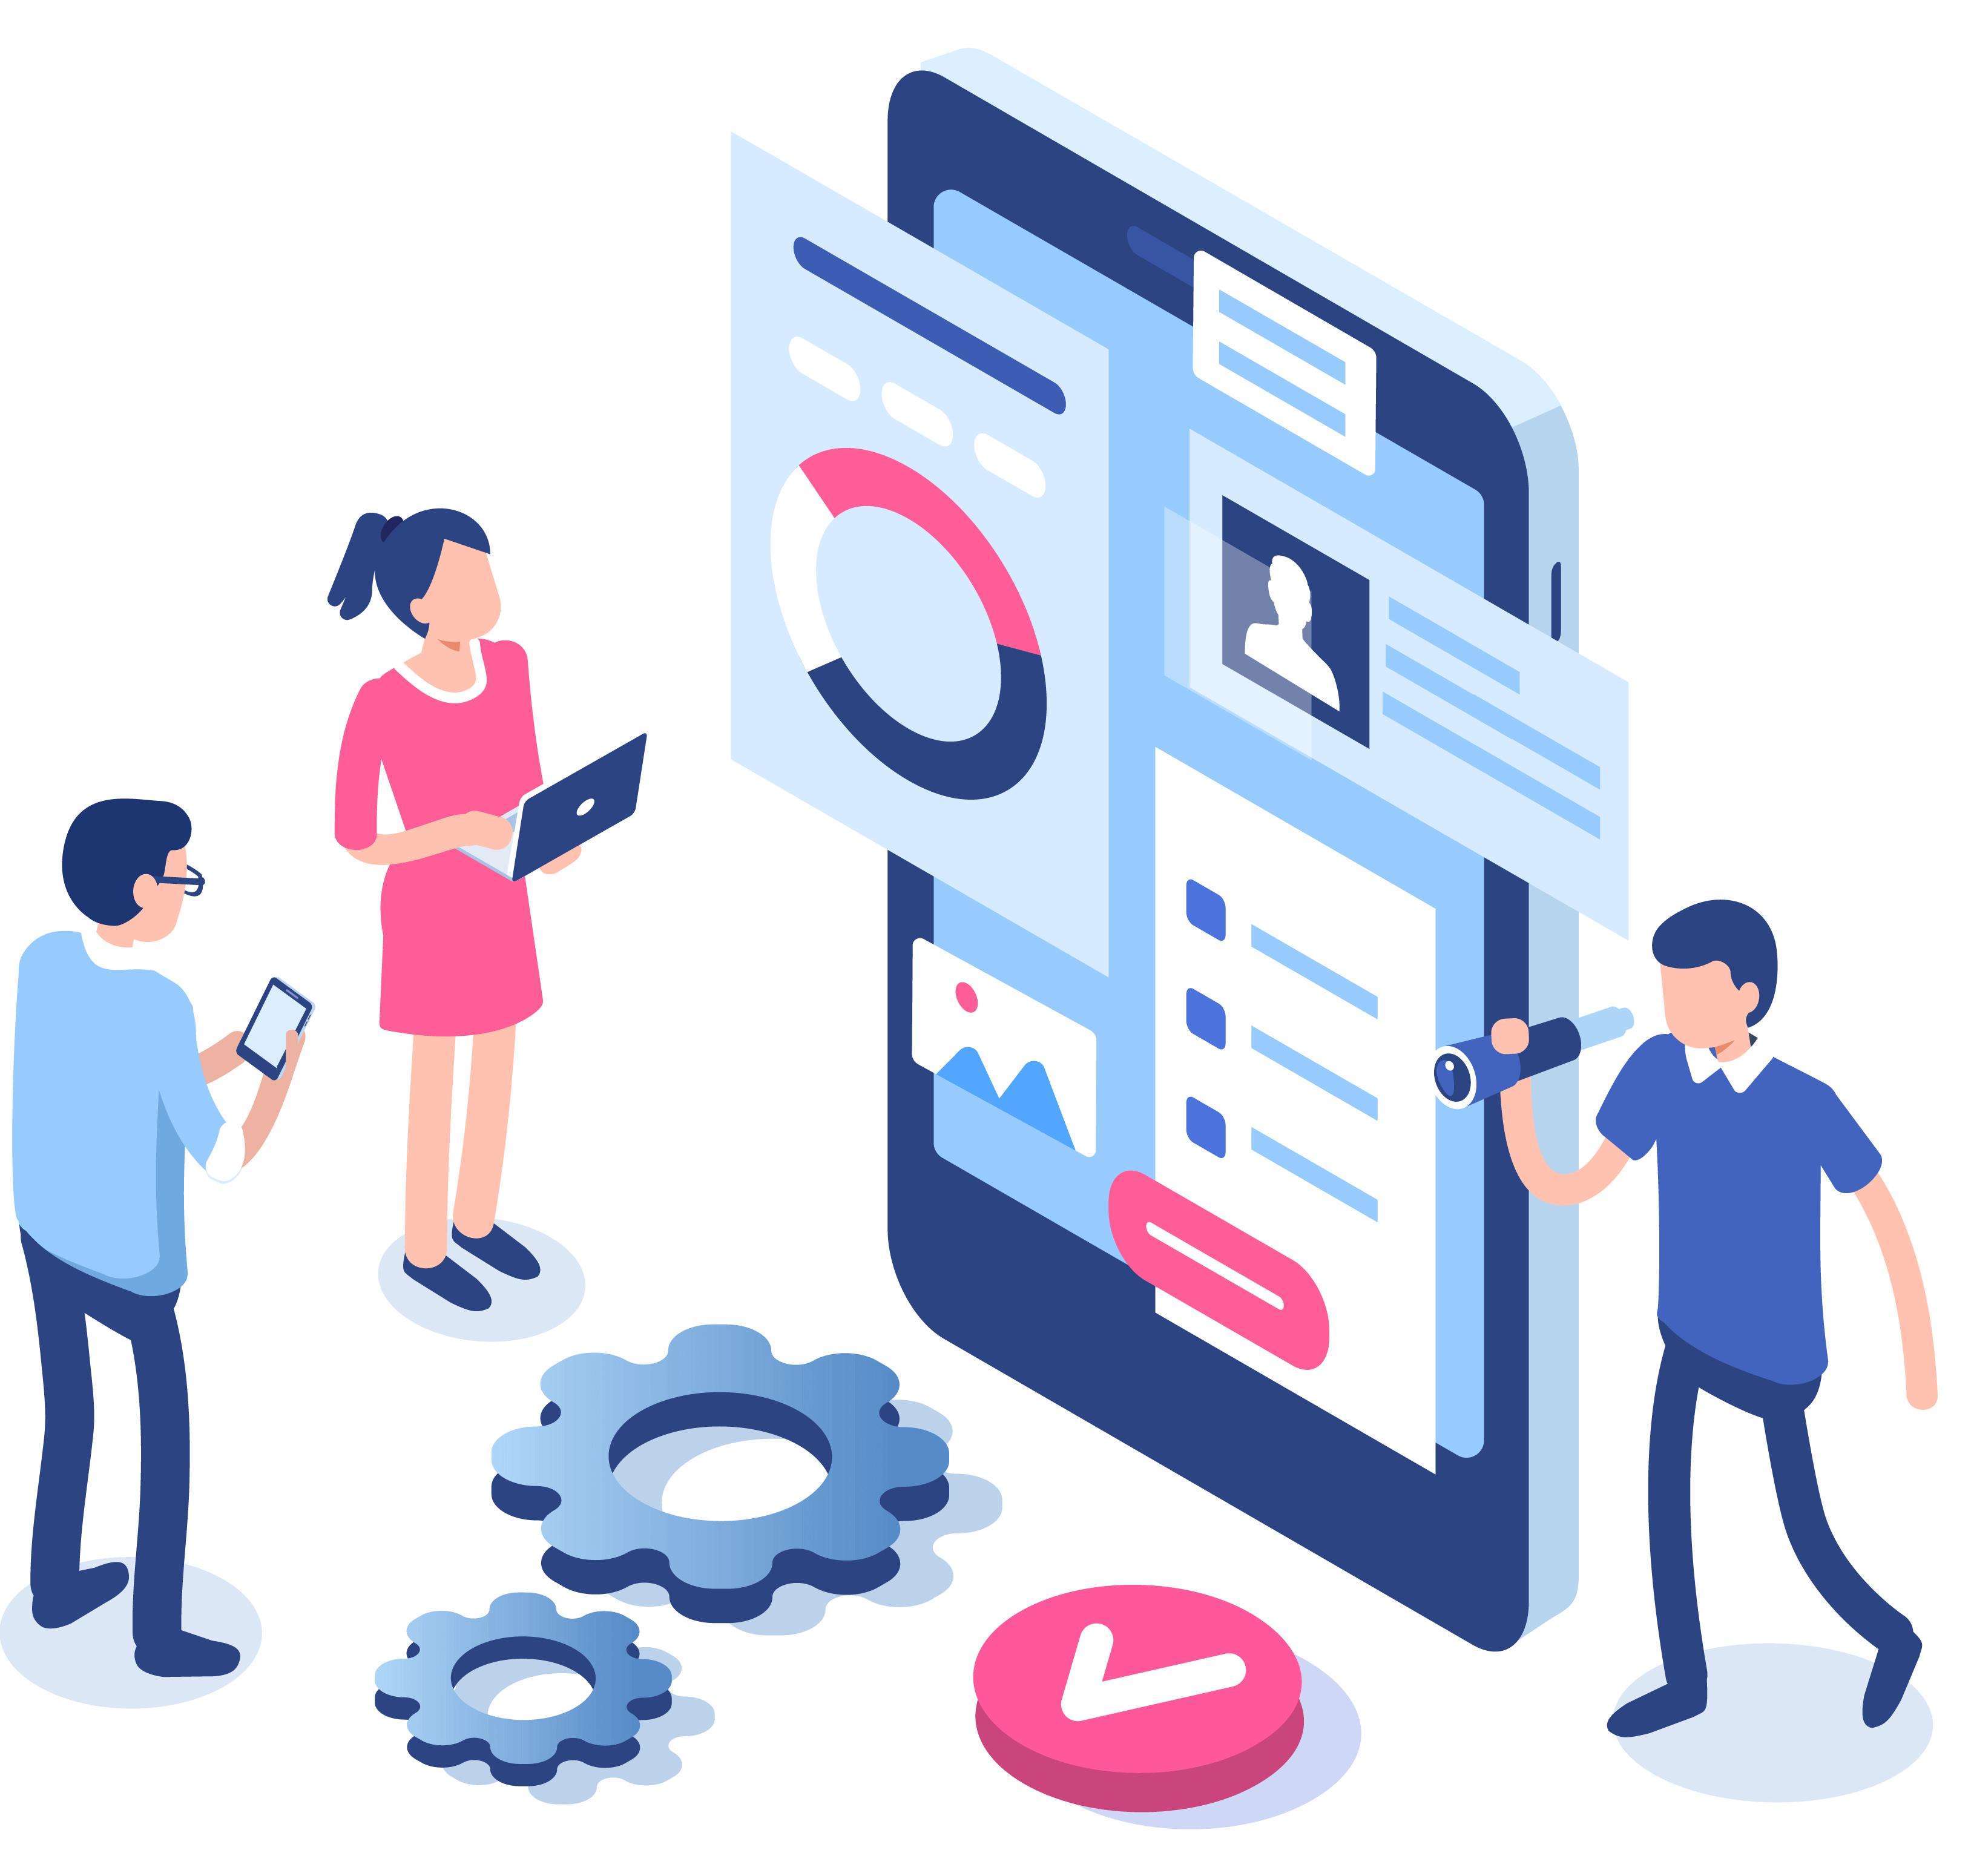 User Testing Software PlaybookUX